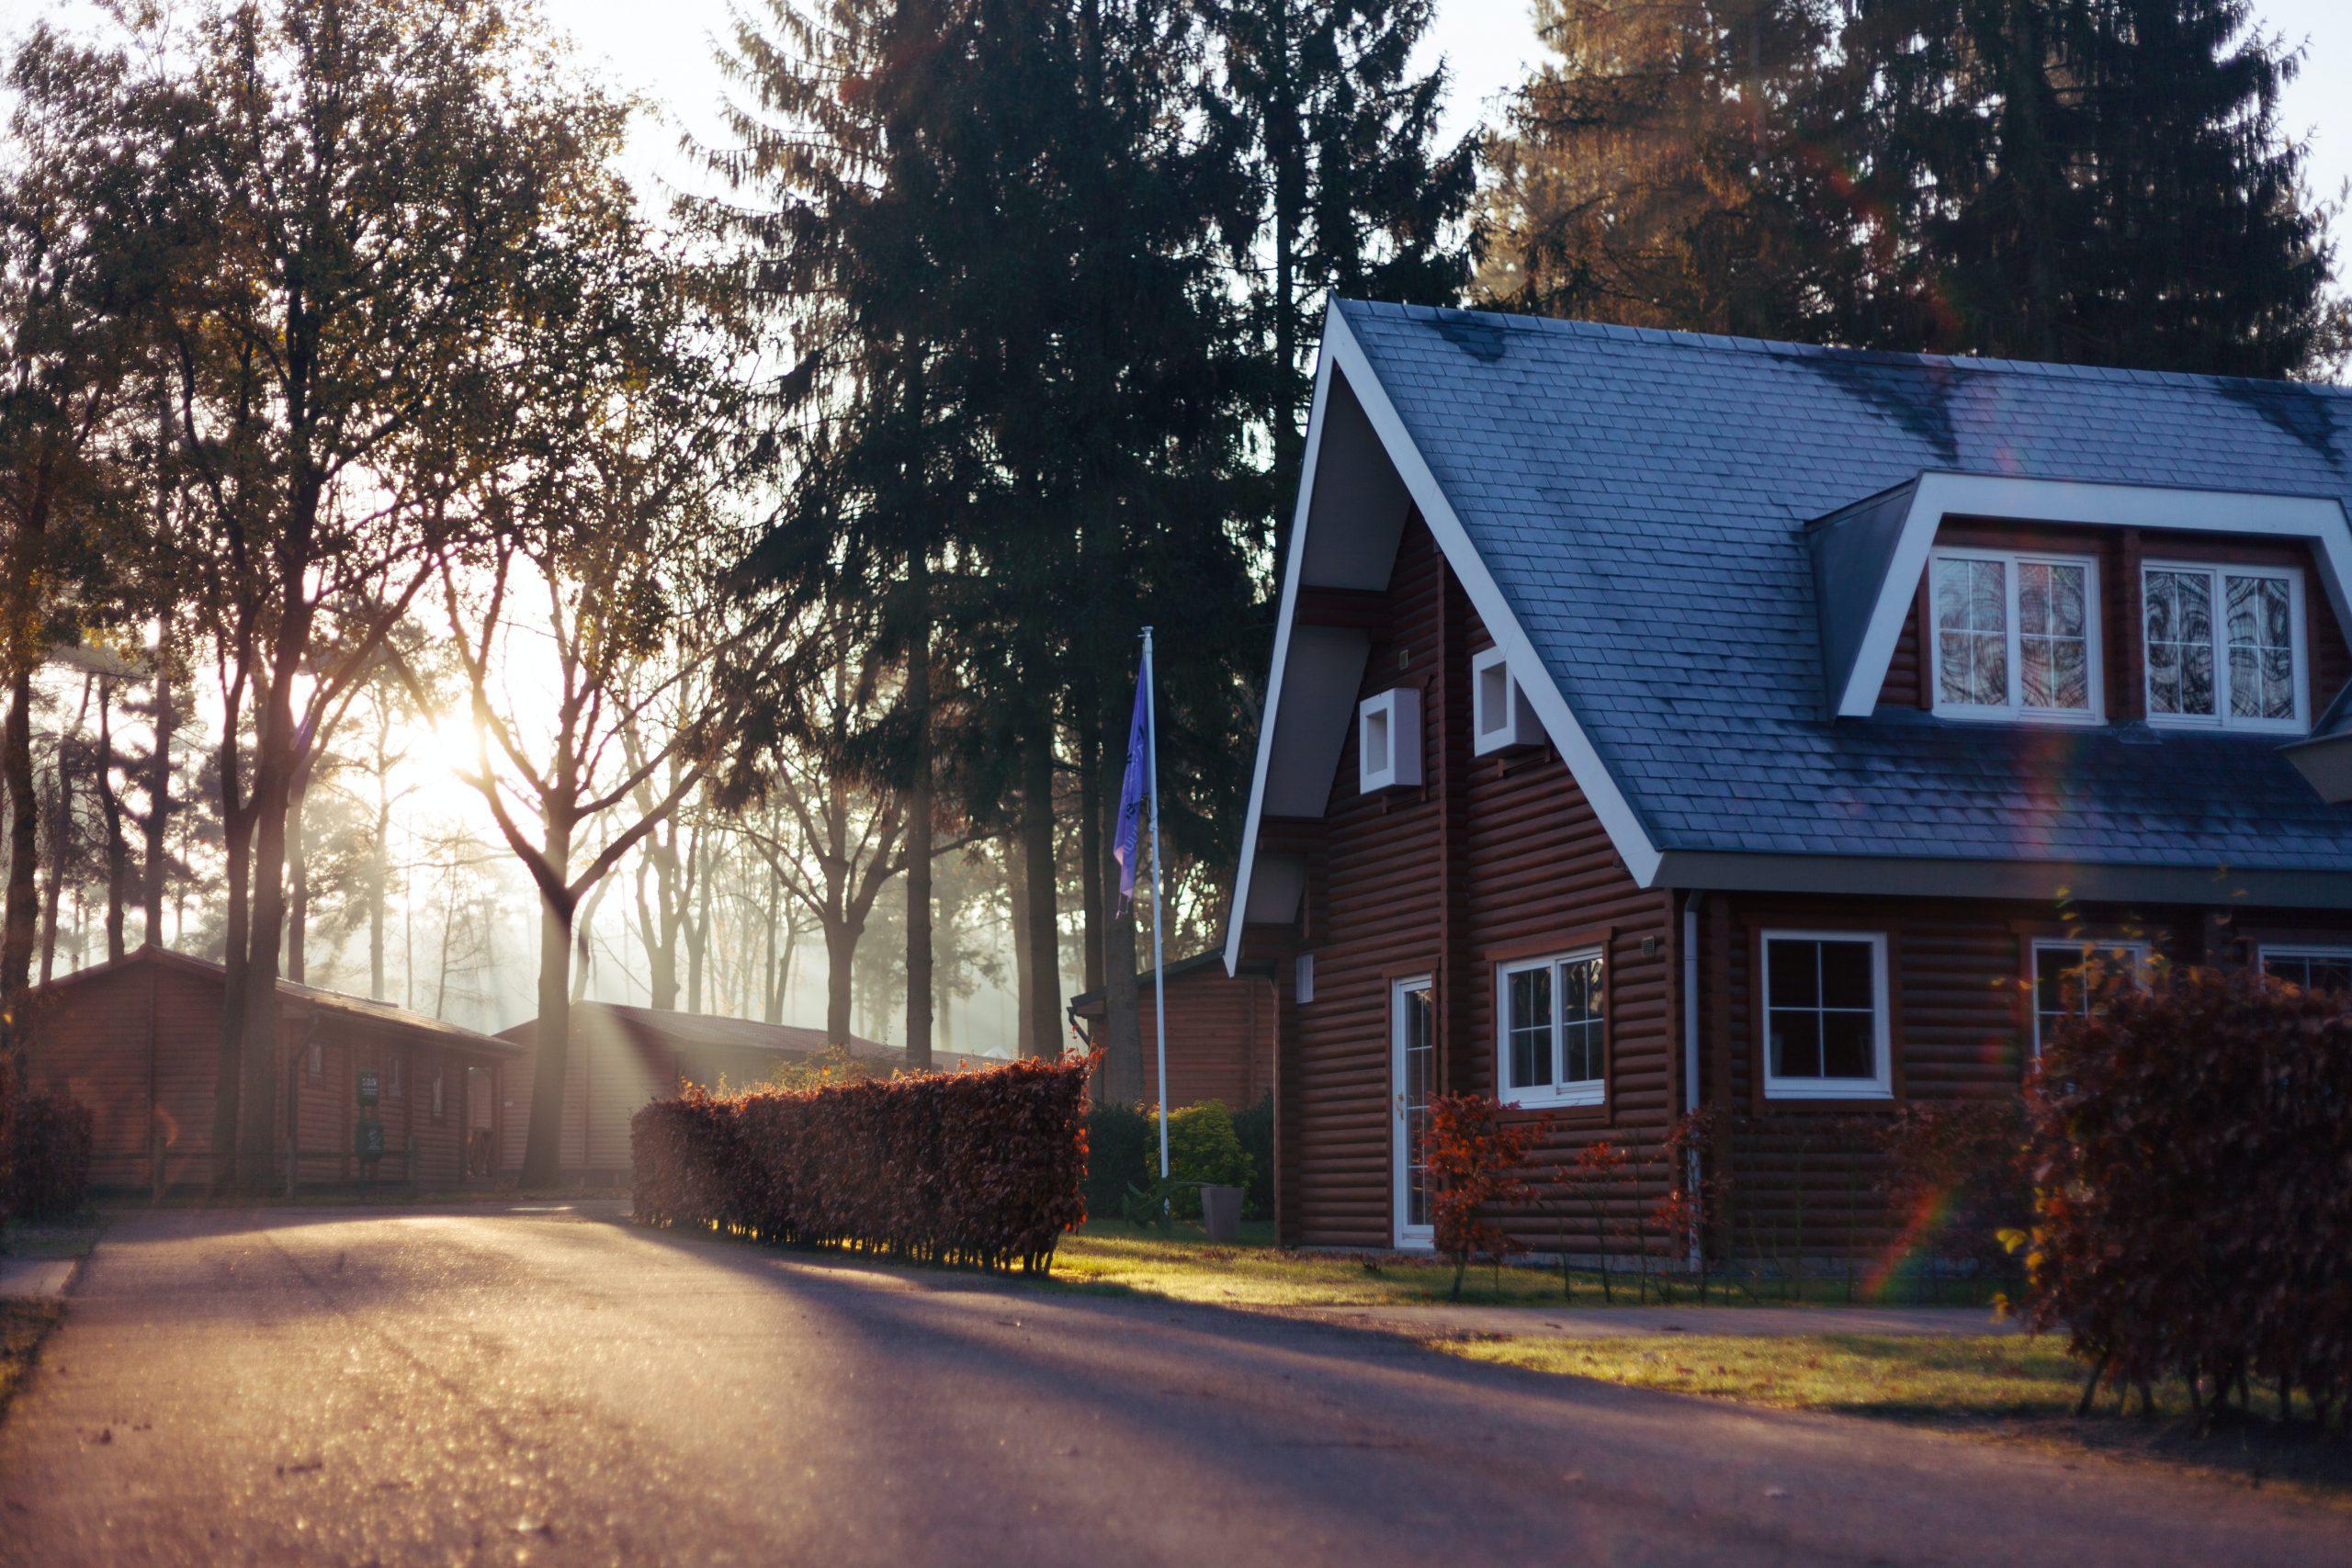 huis opkomende zon